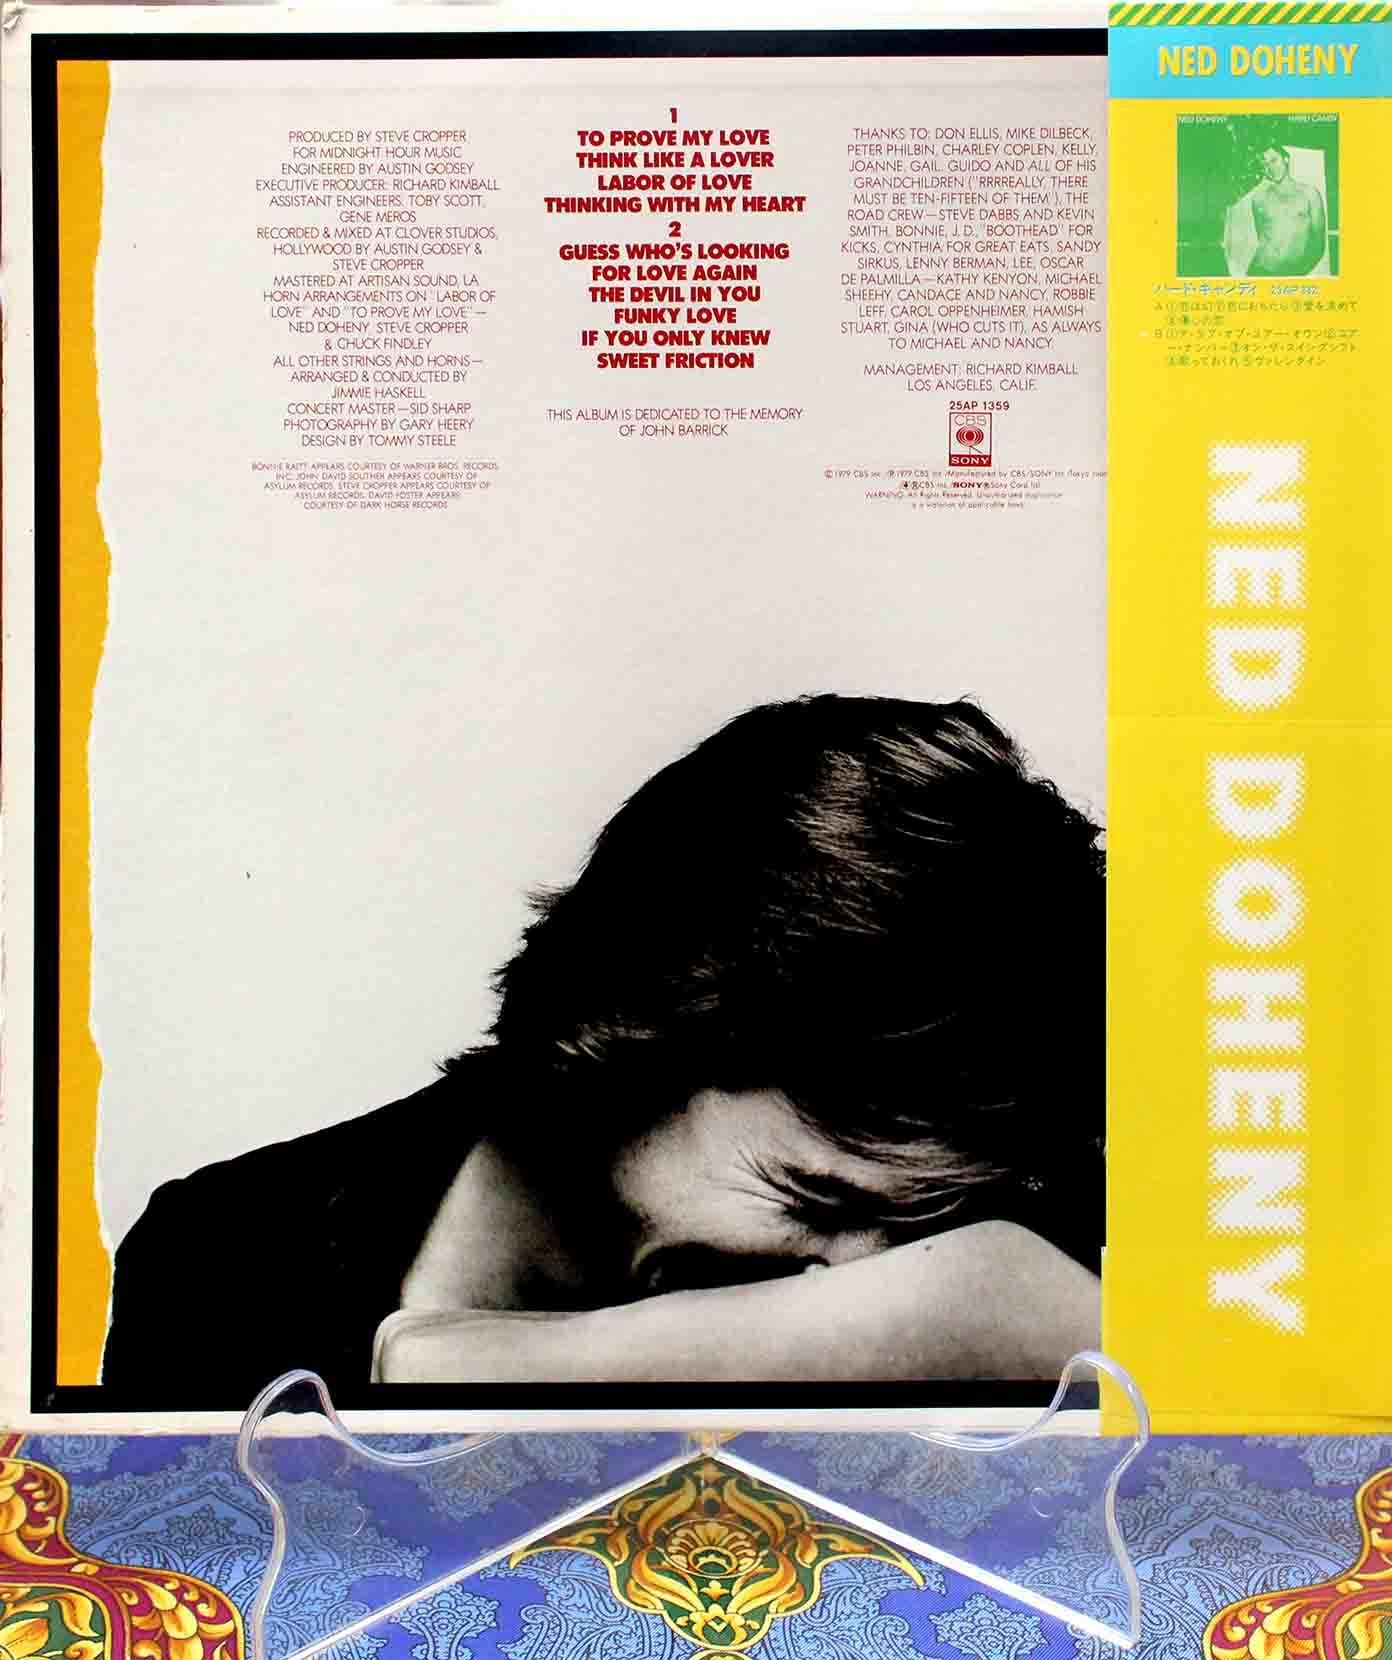 Ned Doheny Prone 02